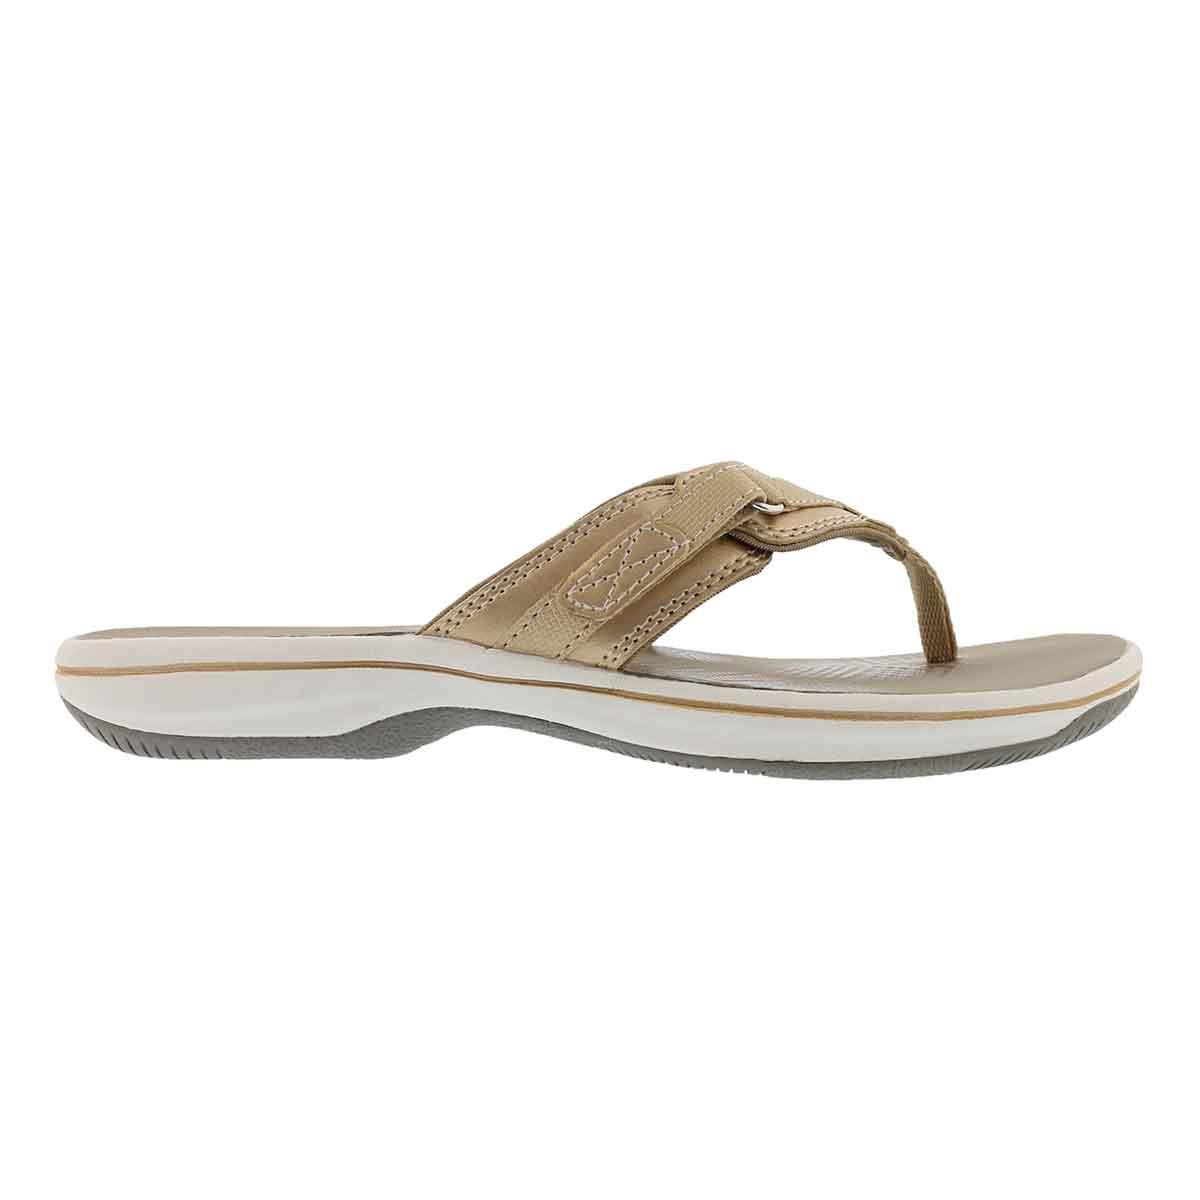 Lds Breeze Sea silver thong sandal